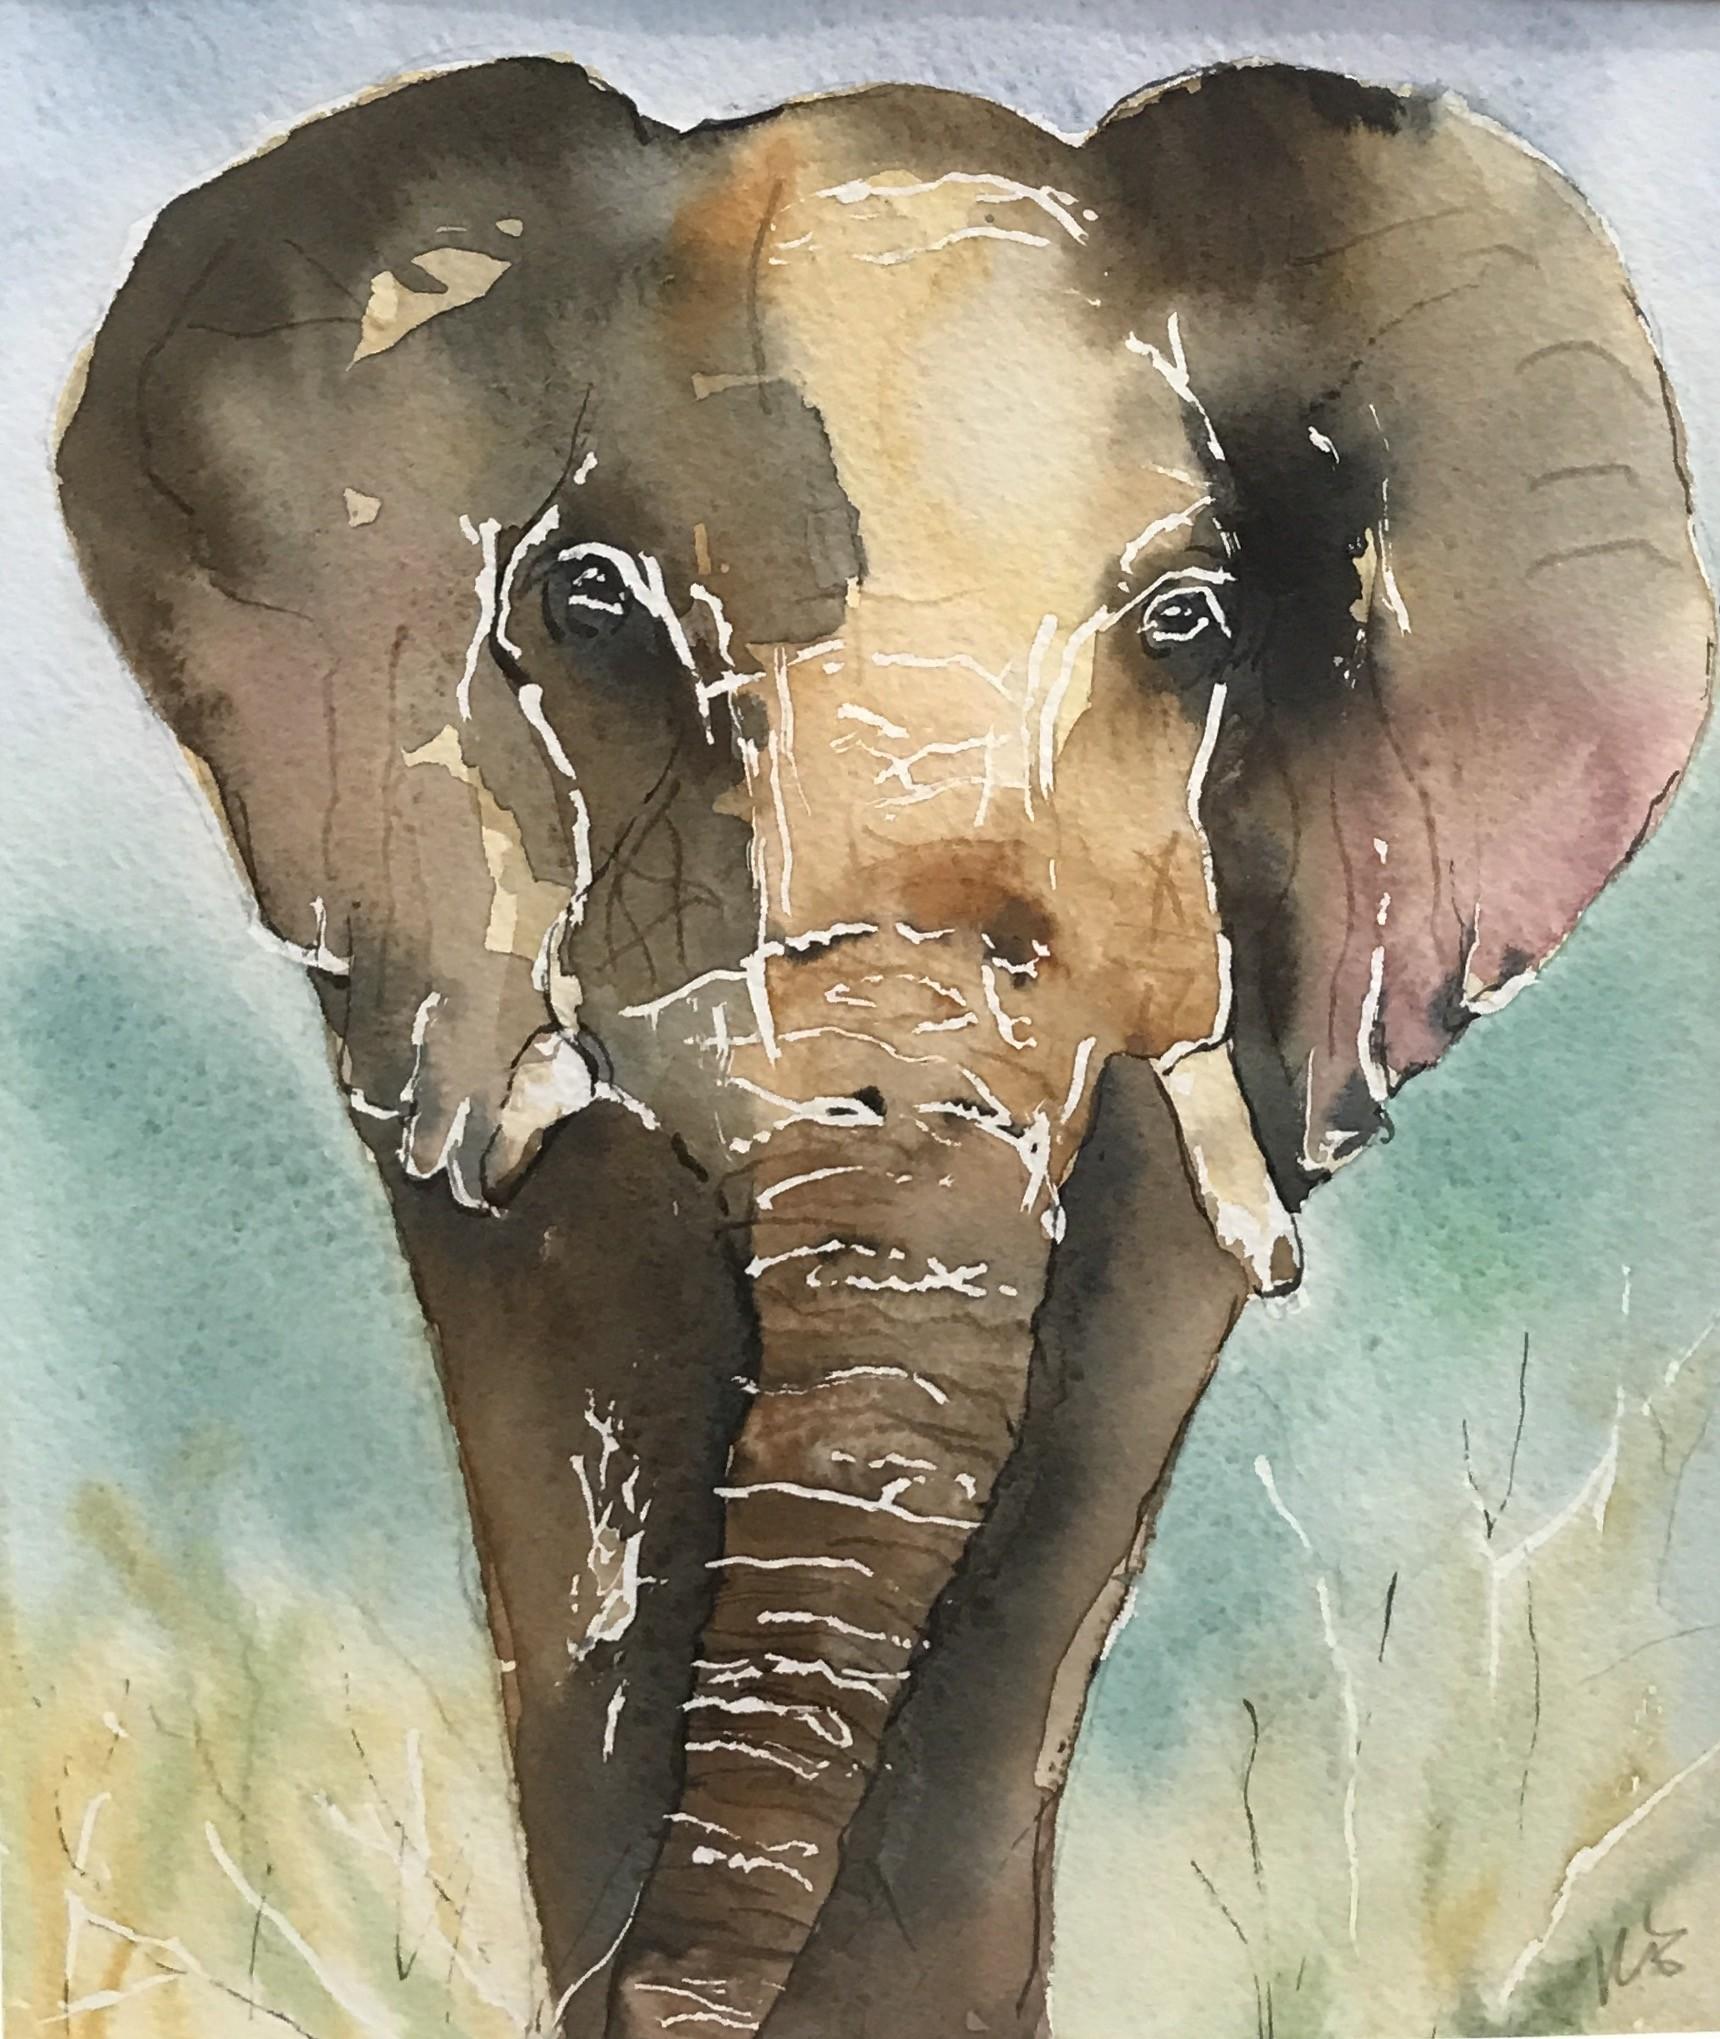 <span class=&#34;link fancybox-details-link&#34;><a href=&#34;/artists/33-kerry-edwards/works/79-kerry-edwards-elephant/&#34;>View Detail Page</a></span><div class=&#34;artist&#34;><strong>Kerry Edwards</strong></div> <div class=&#34;title&#34;><em>Elephant</em></div> <div class=&#34;medium&#34;>Watercolour (framed)</div> <div class=&#34;dimensions&#34;>22 x 19 cm</div><div class=&#34;price&#34;>£130.00</div>